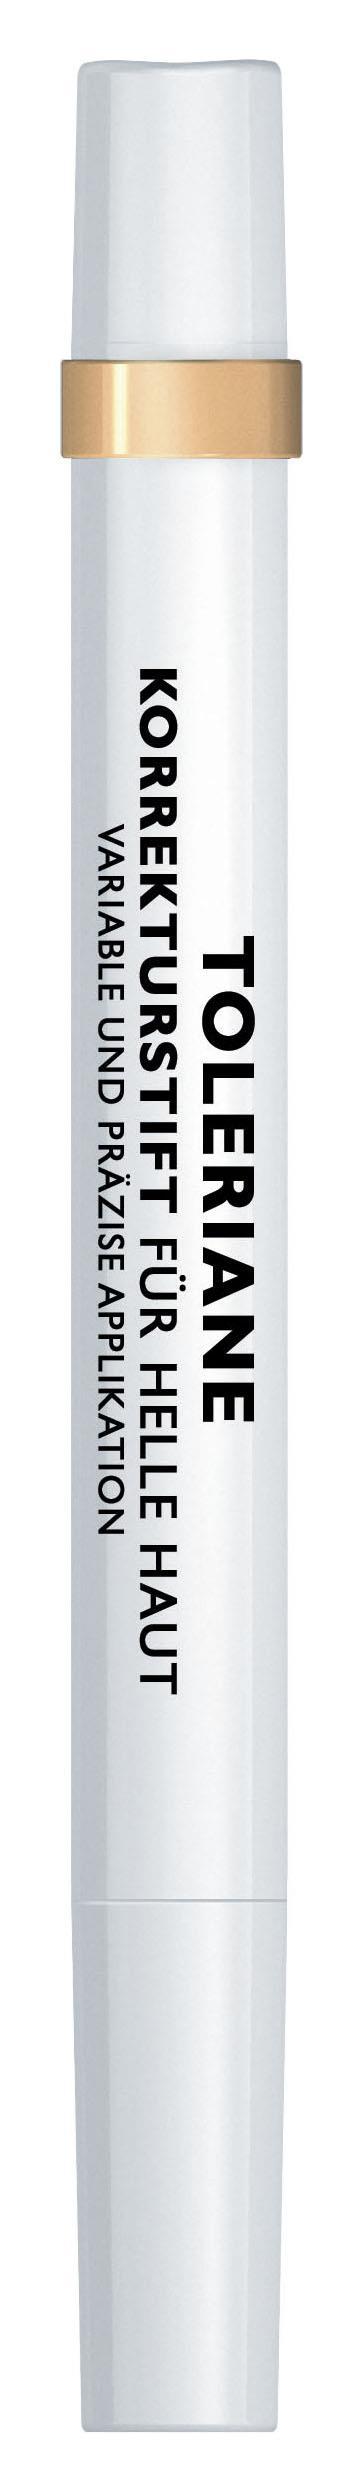 La Roche-Posay Toleriane Teint Korrekturstift